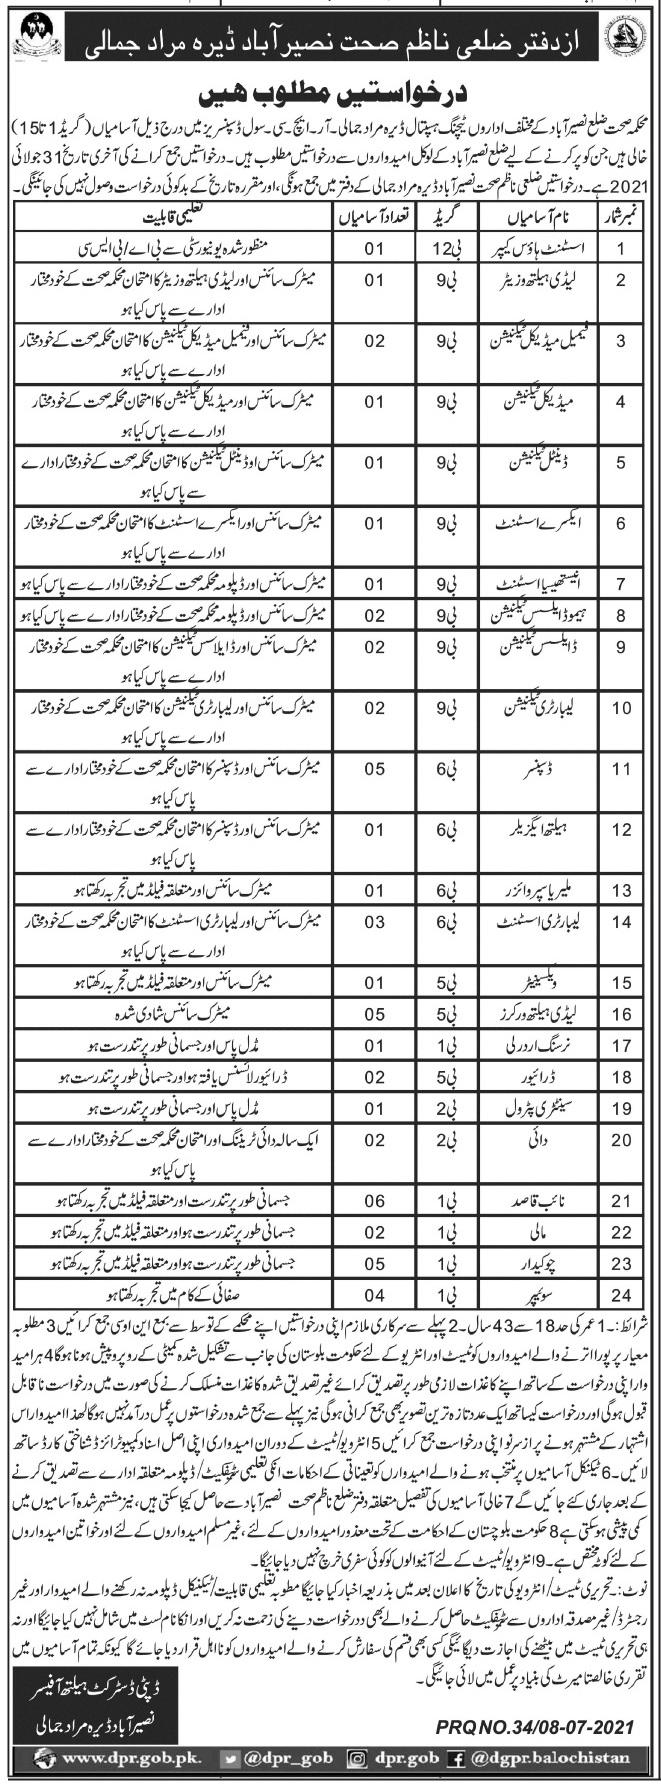 Health Department Jobs 2021 For Medical Staff In Dera Murad Jamali